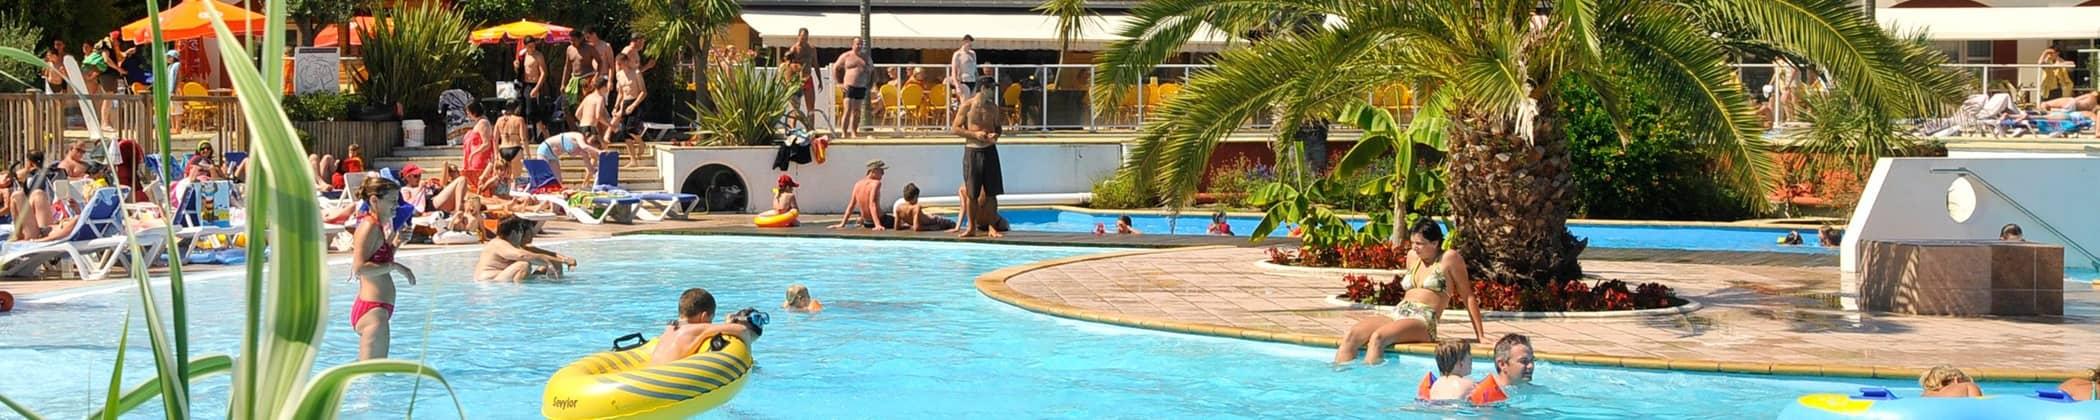 Camping Sylvamar piscine